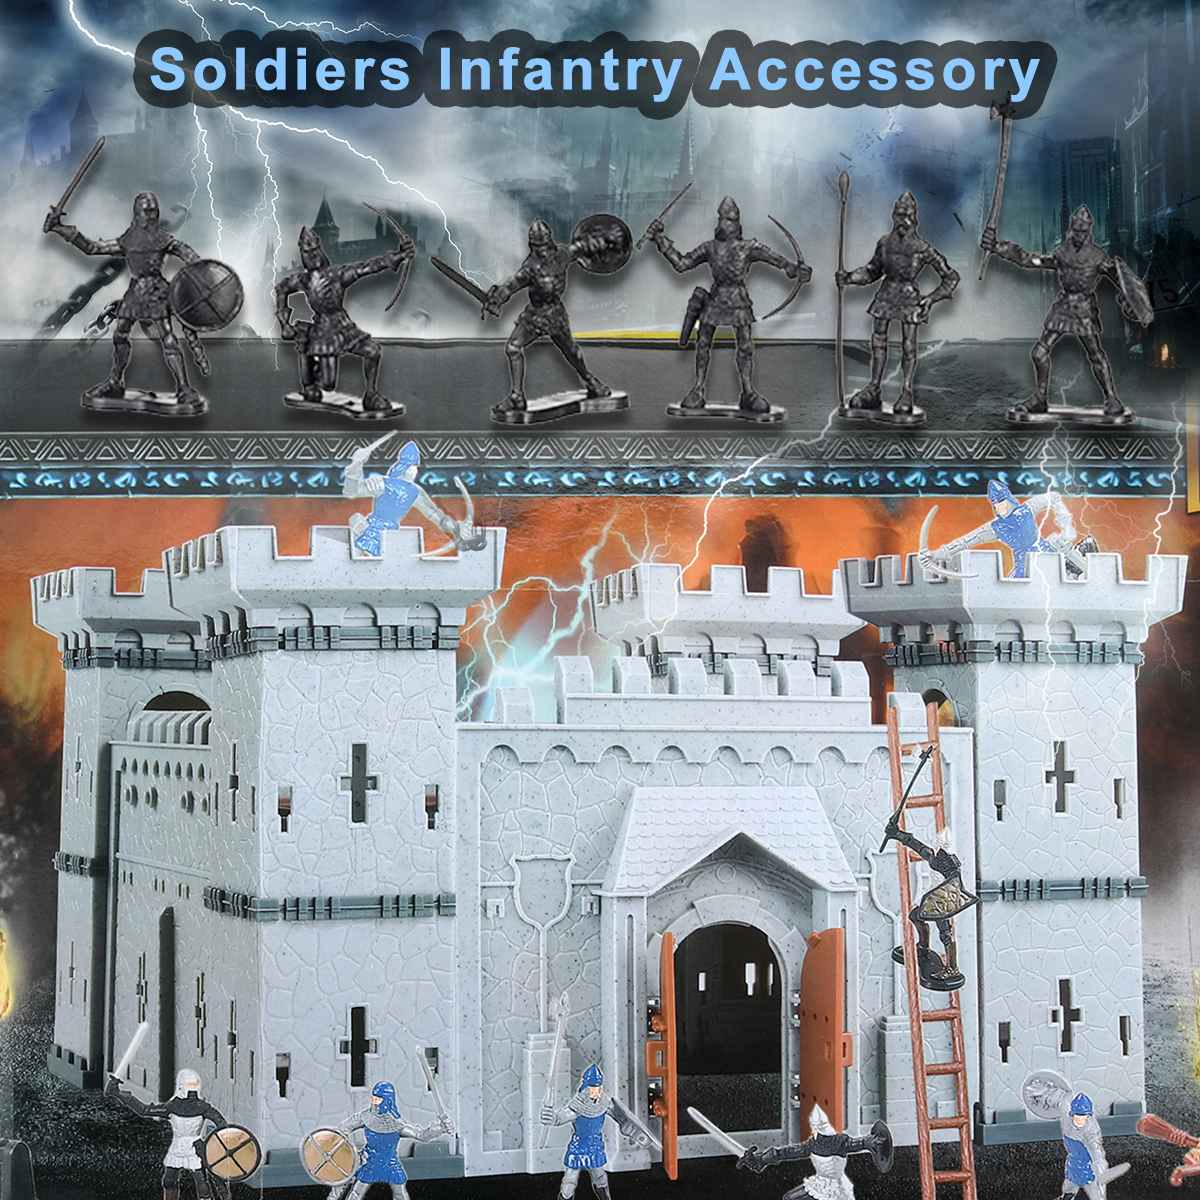 Mediaeval Castle Soldiers Model Assembled Building Block War Military S Plastics Figures Toy DIY Toy For Children